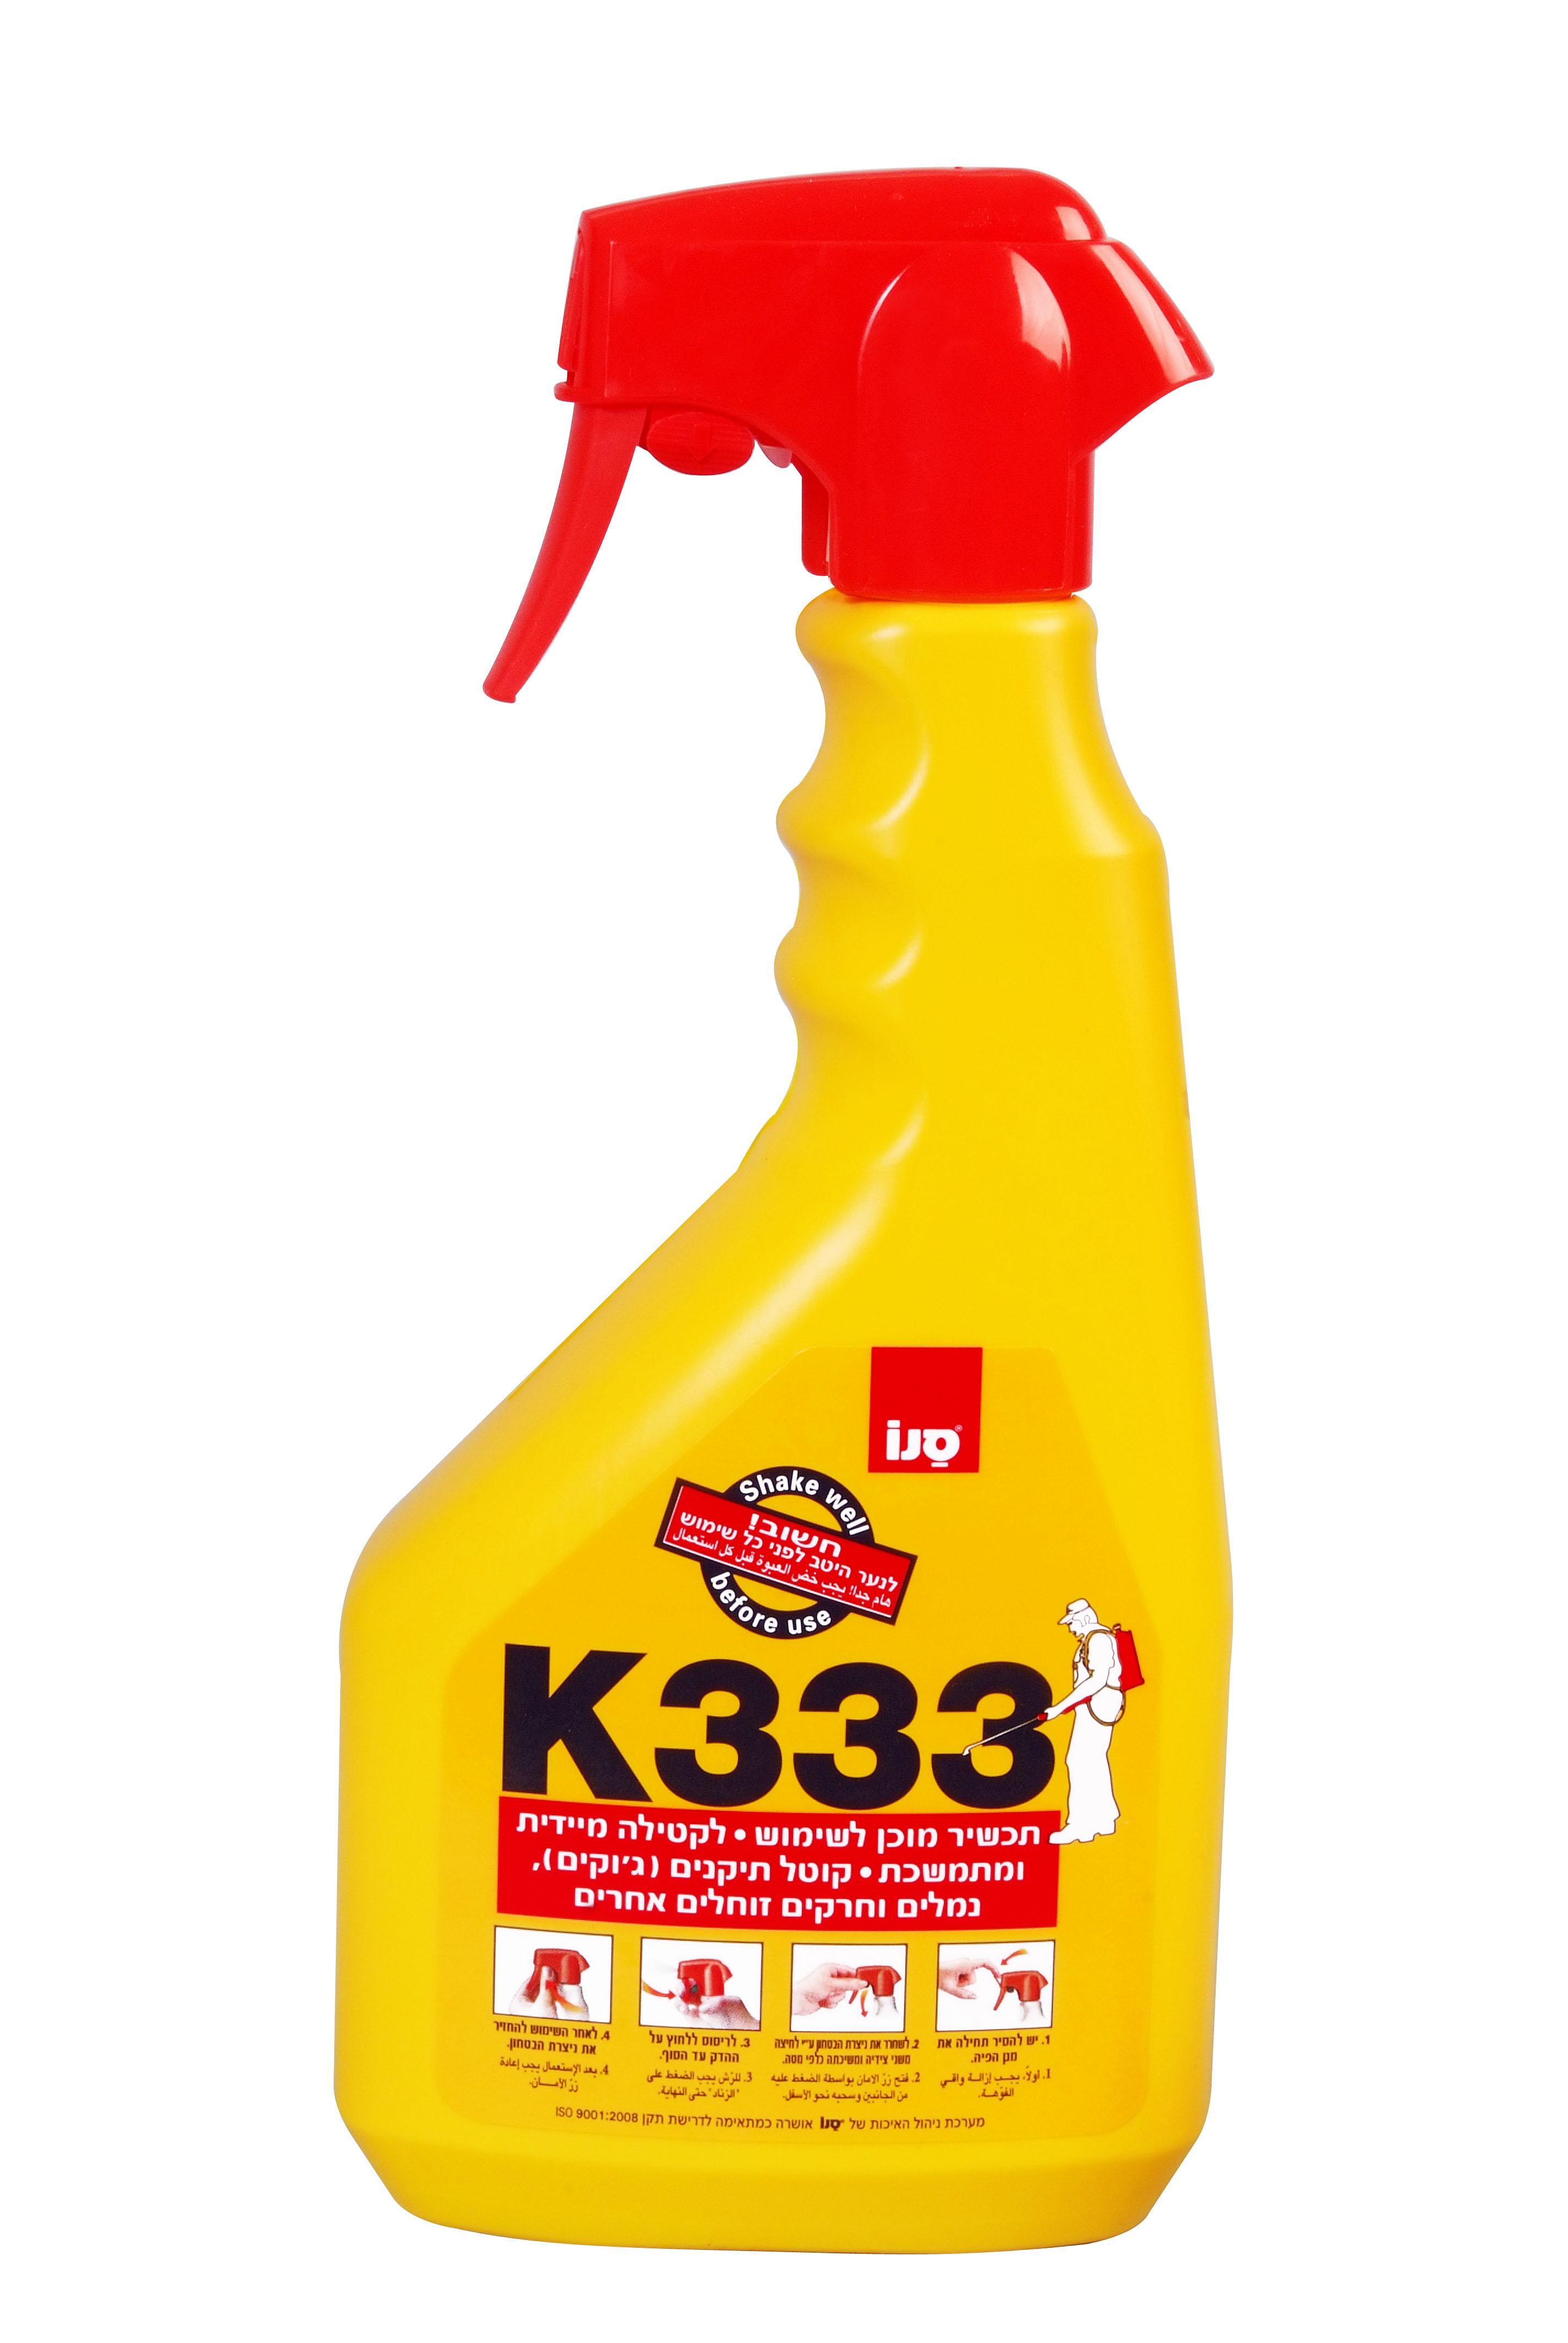 K-333